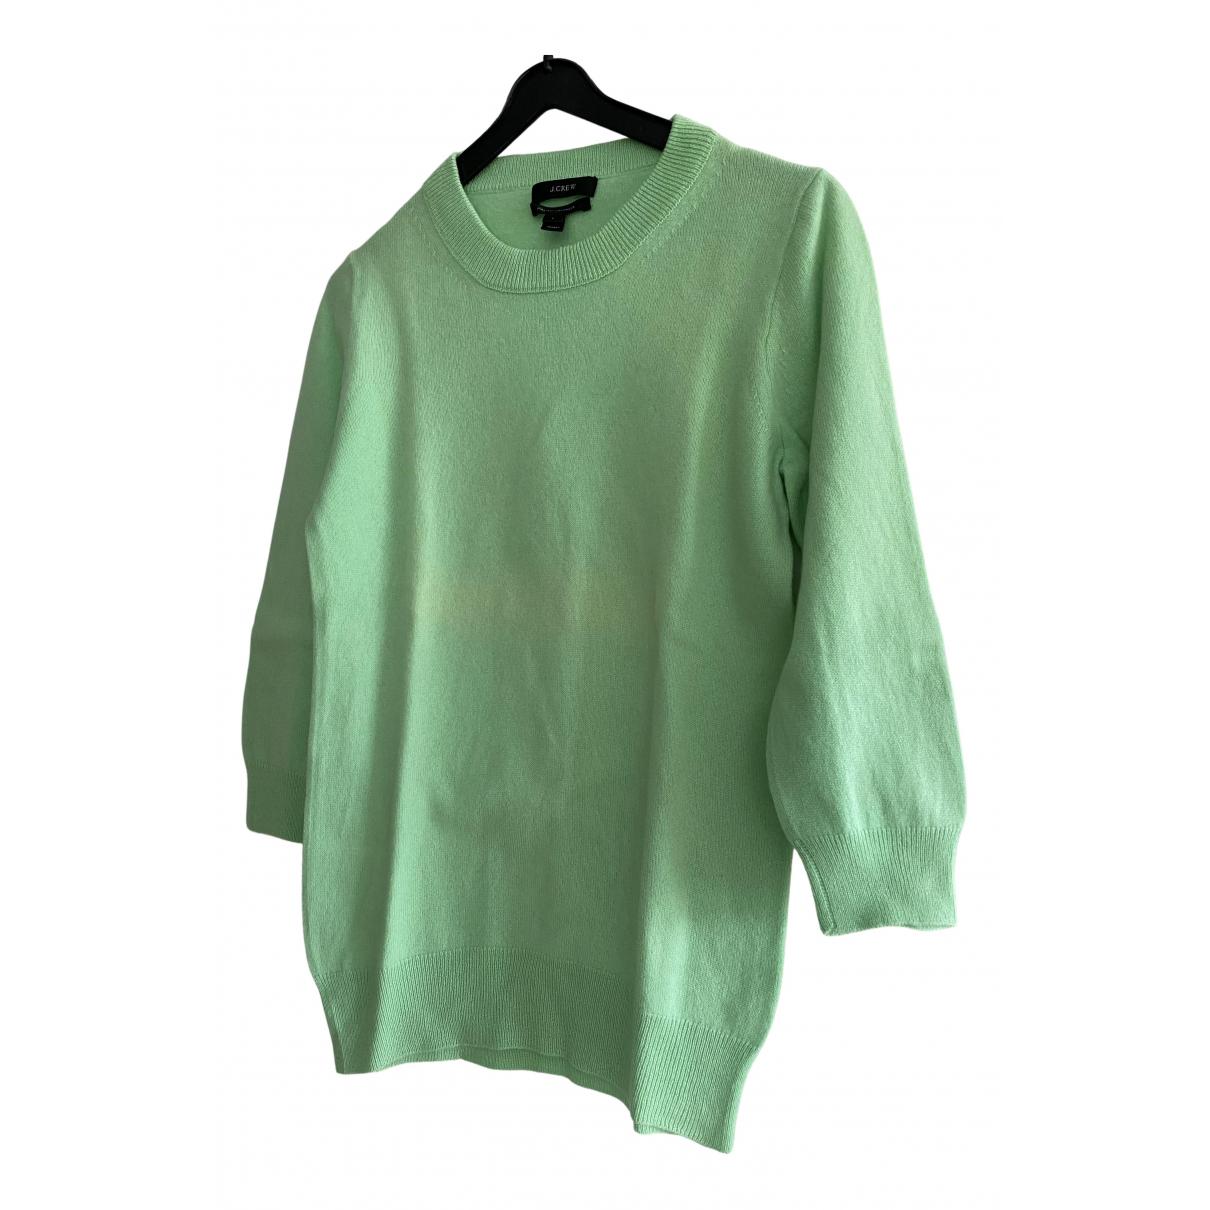 J.crew N Green Cashmere Knitwear for Women 1 US